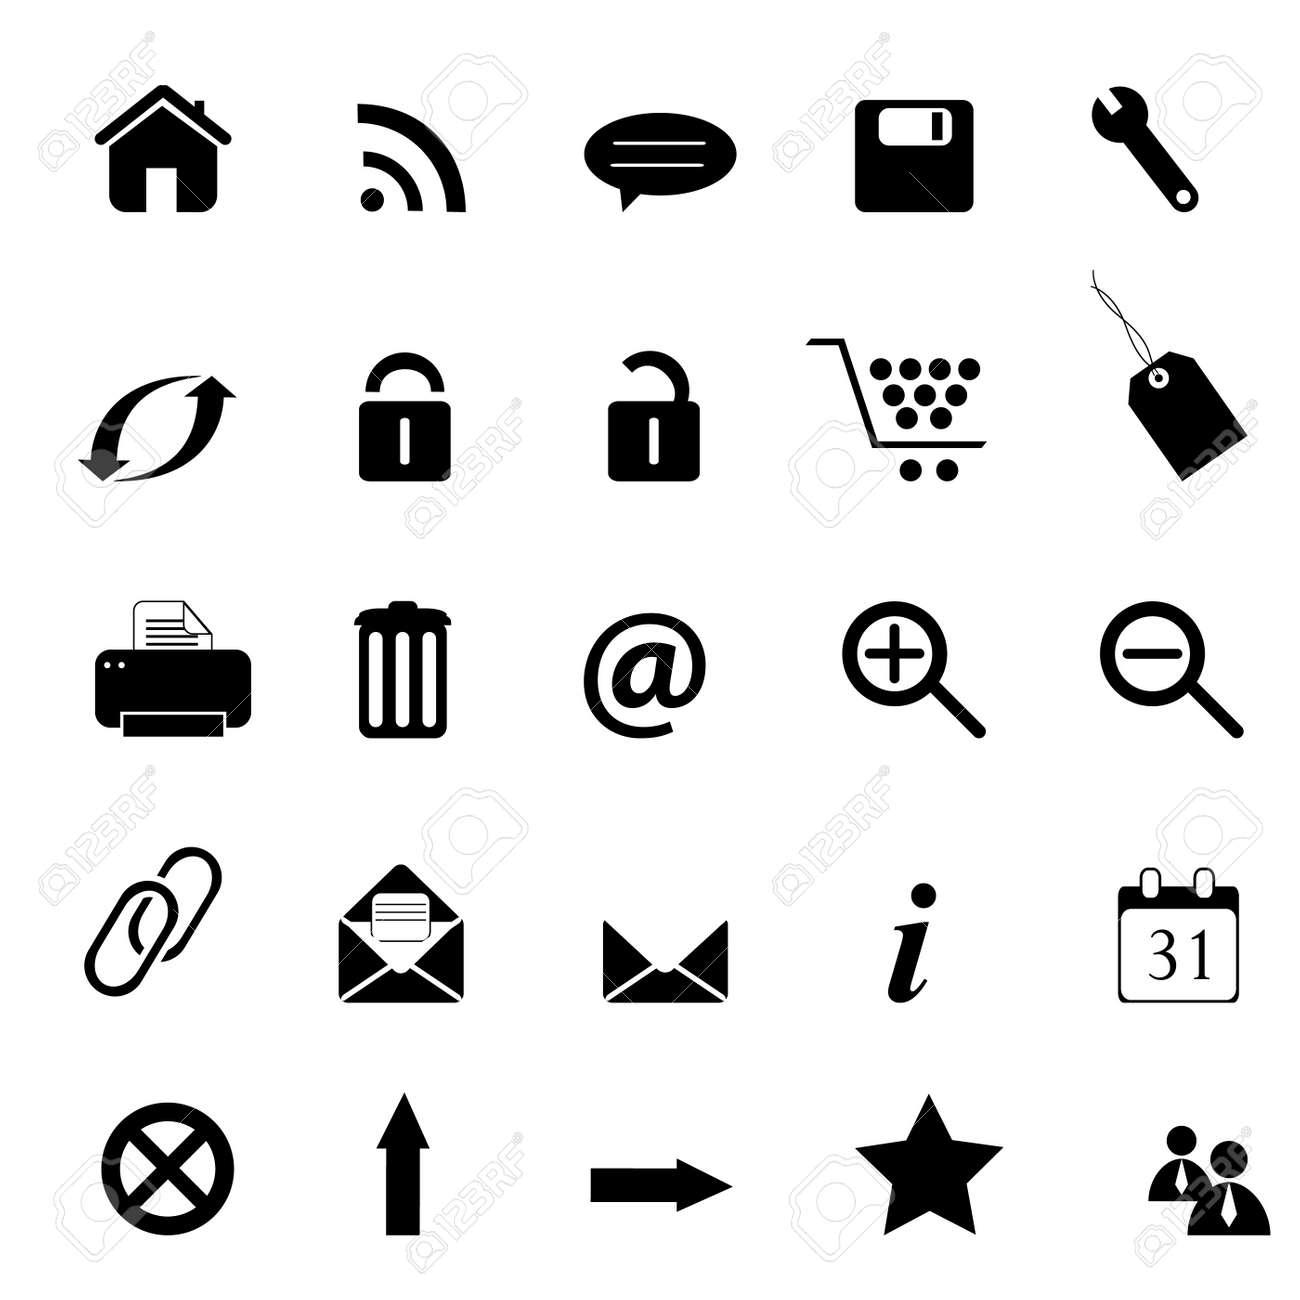 Web, e-commerce, e-business and internet icons Stock Photo - 7547550